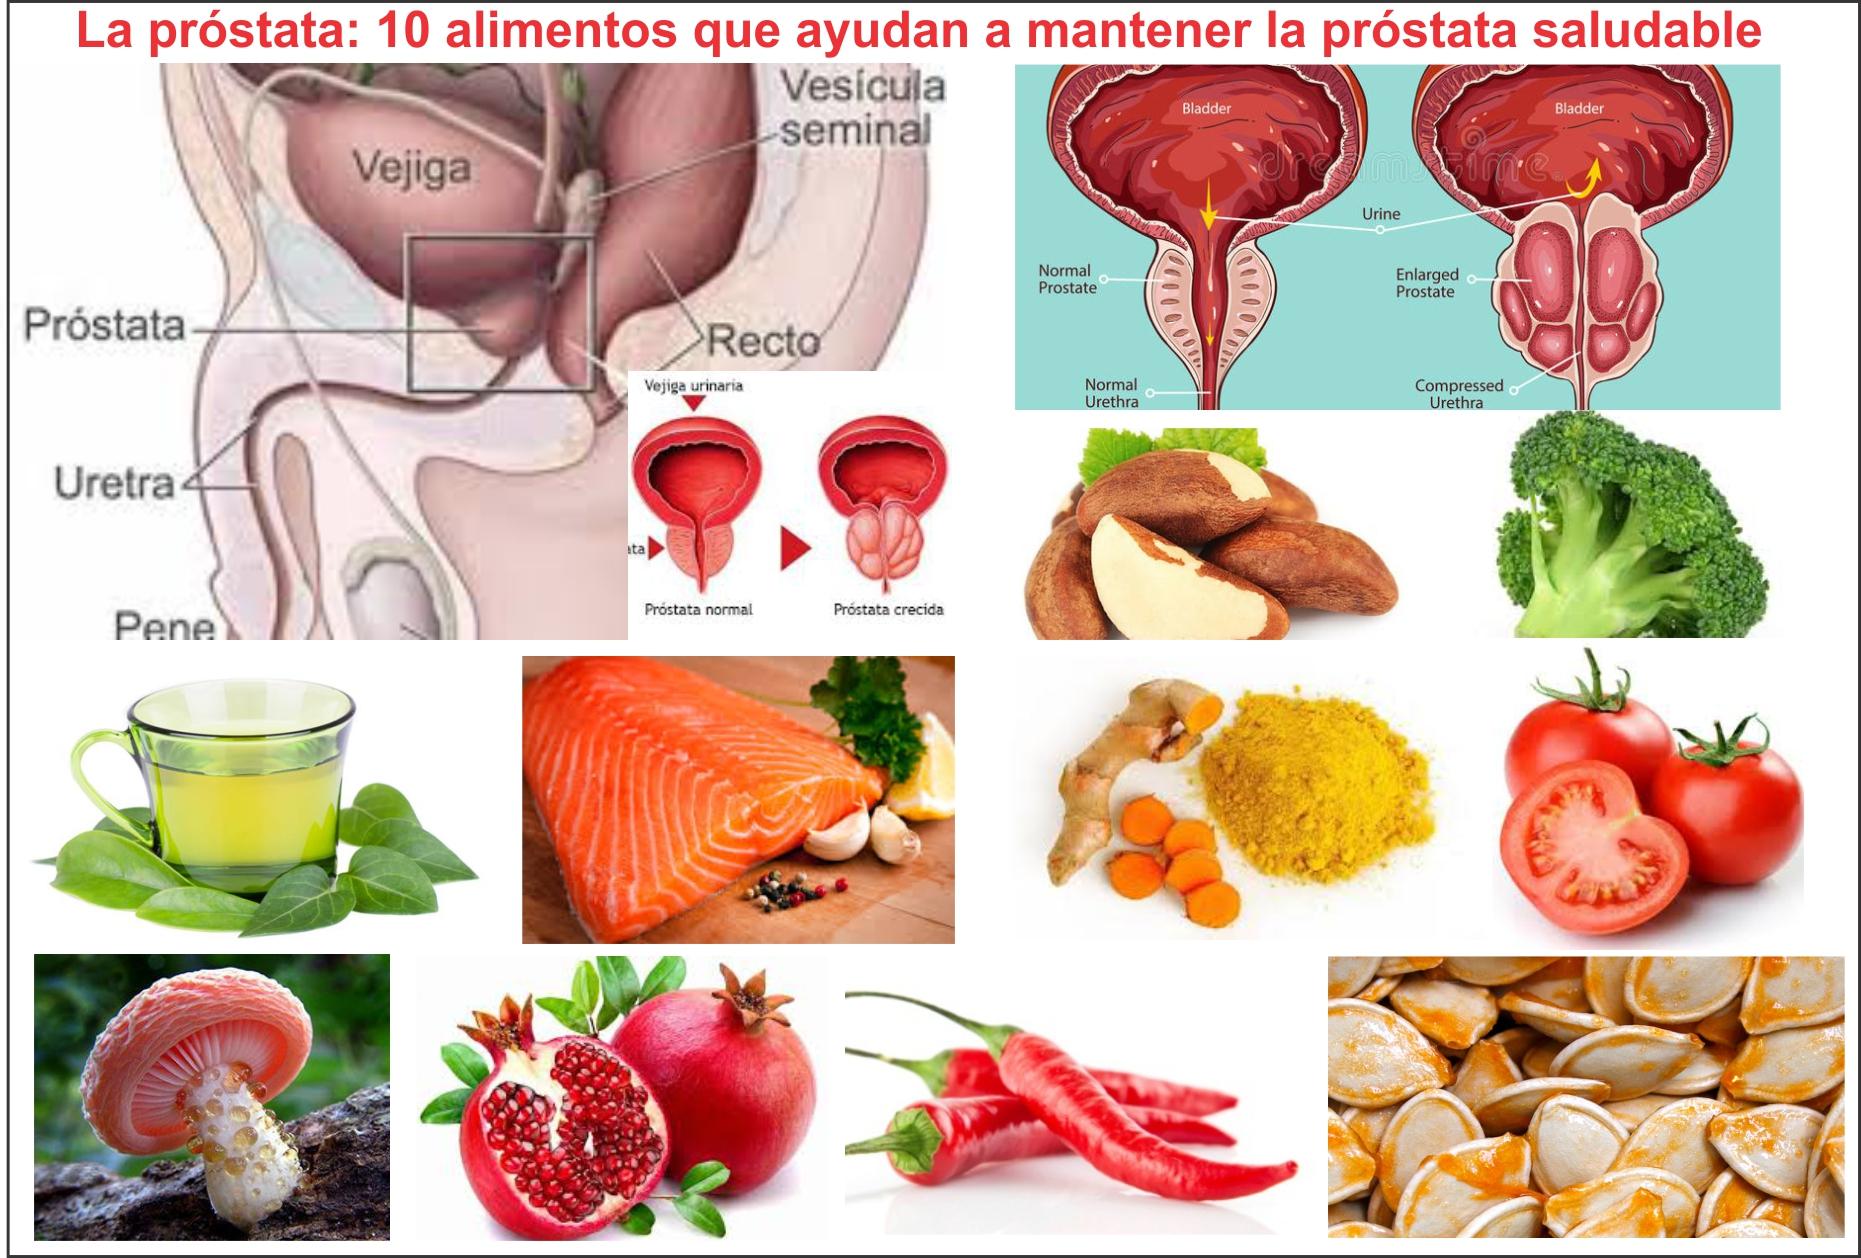 próstata agrandada de especias